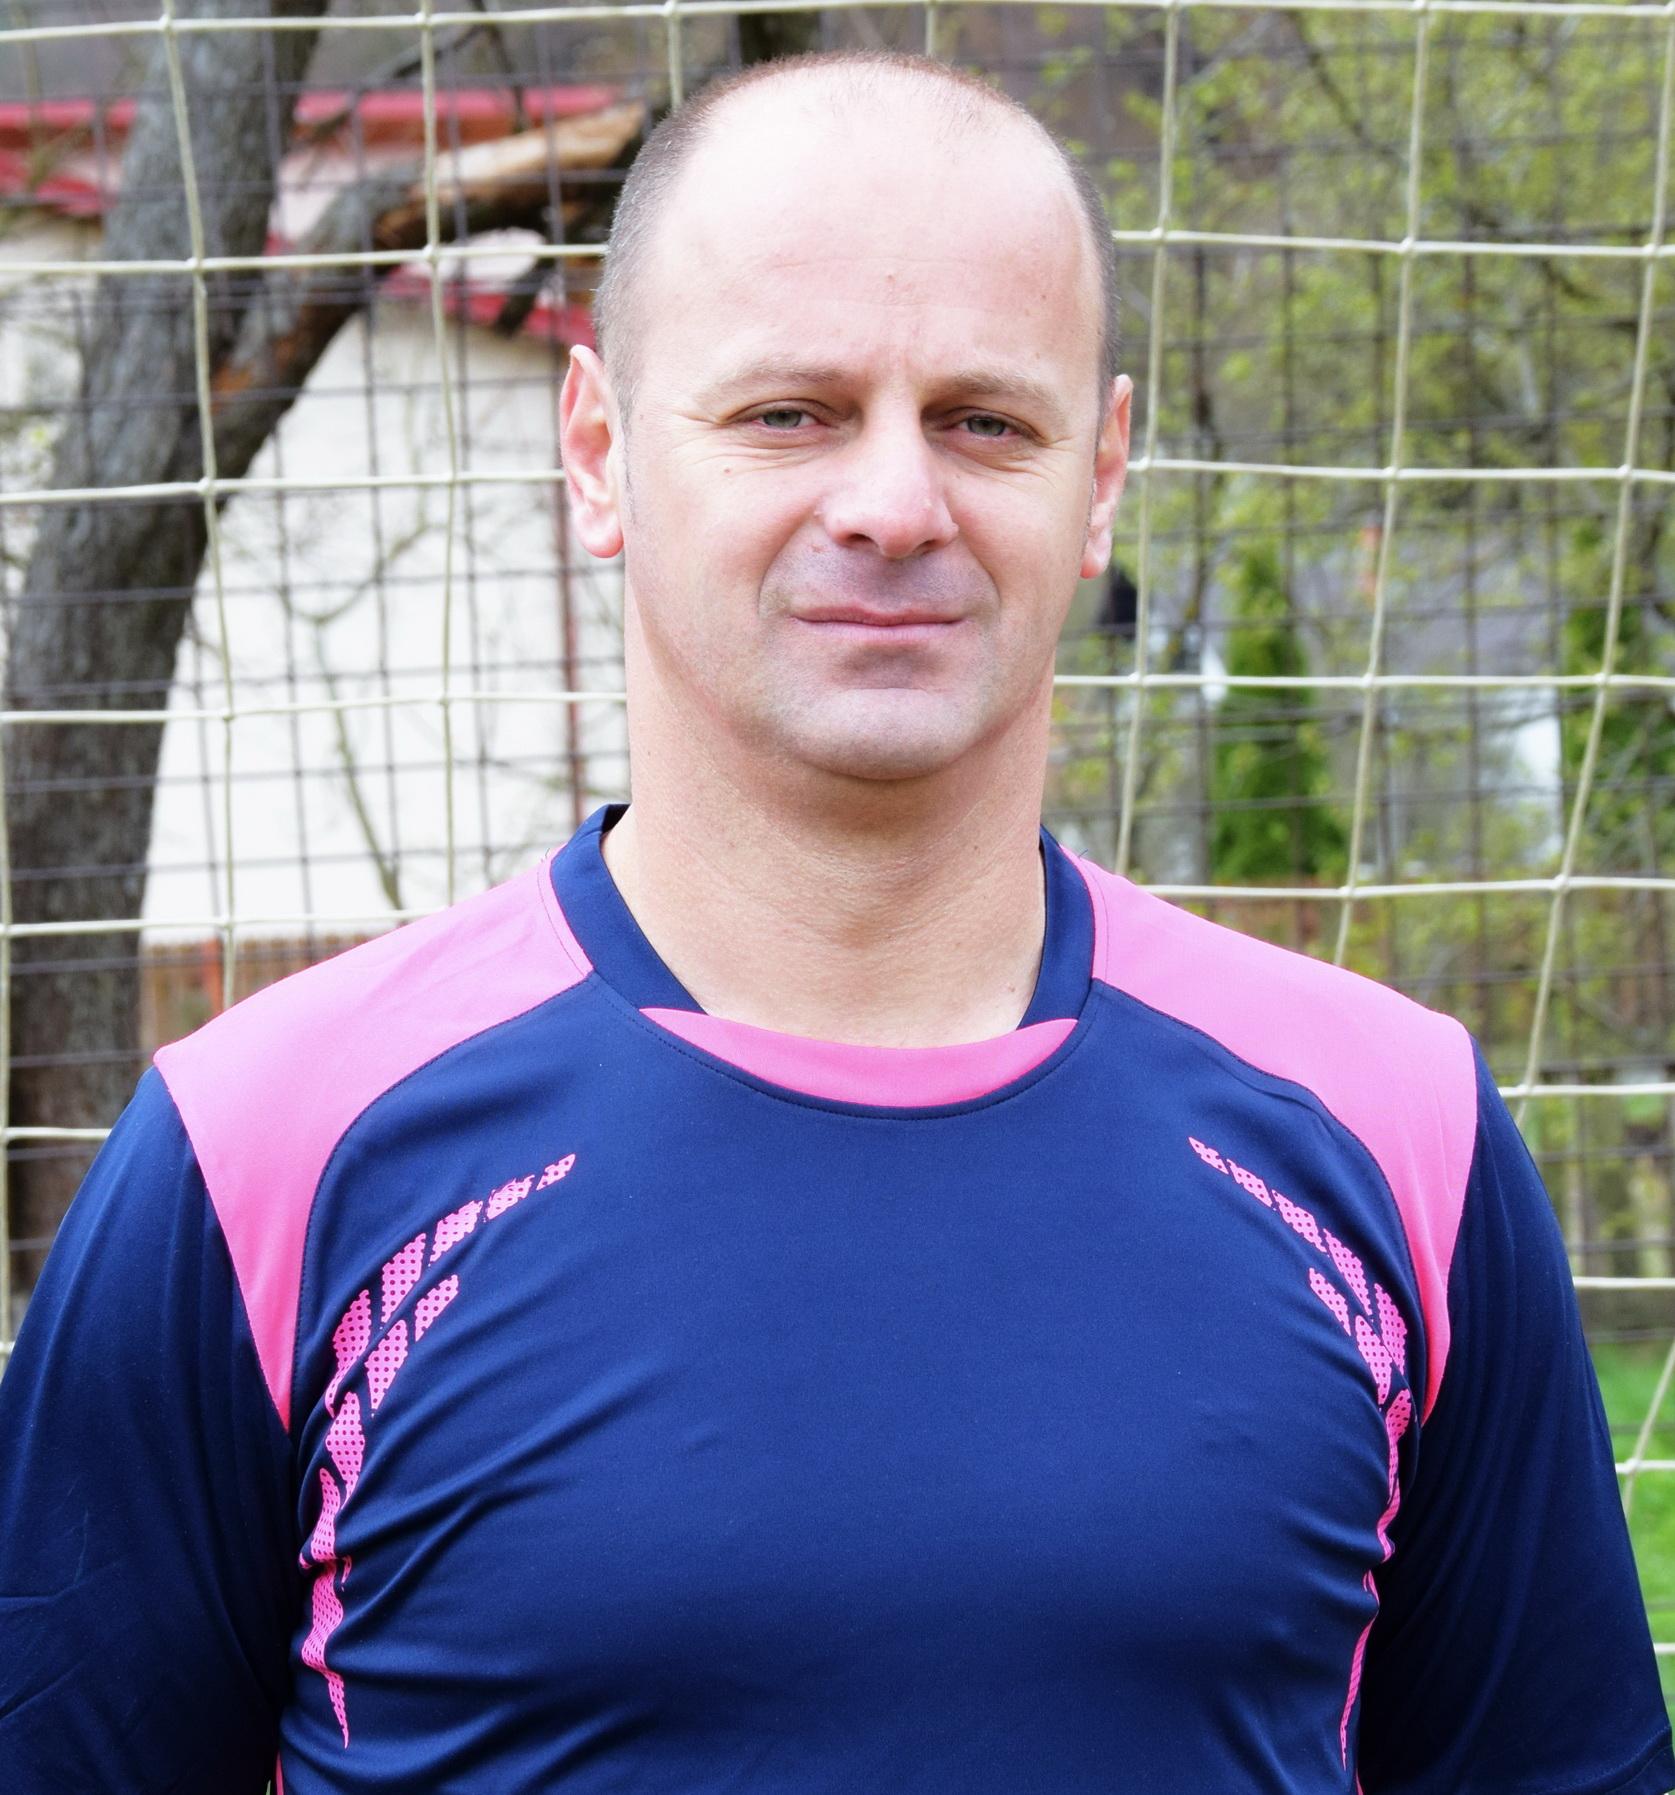 Gheorghe Iulian Vasile